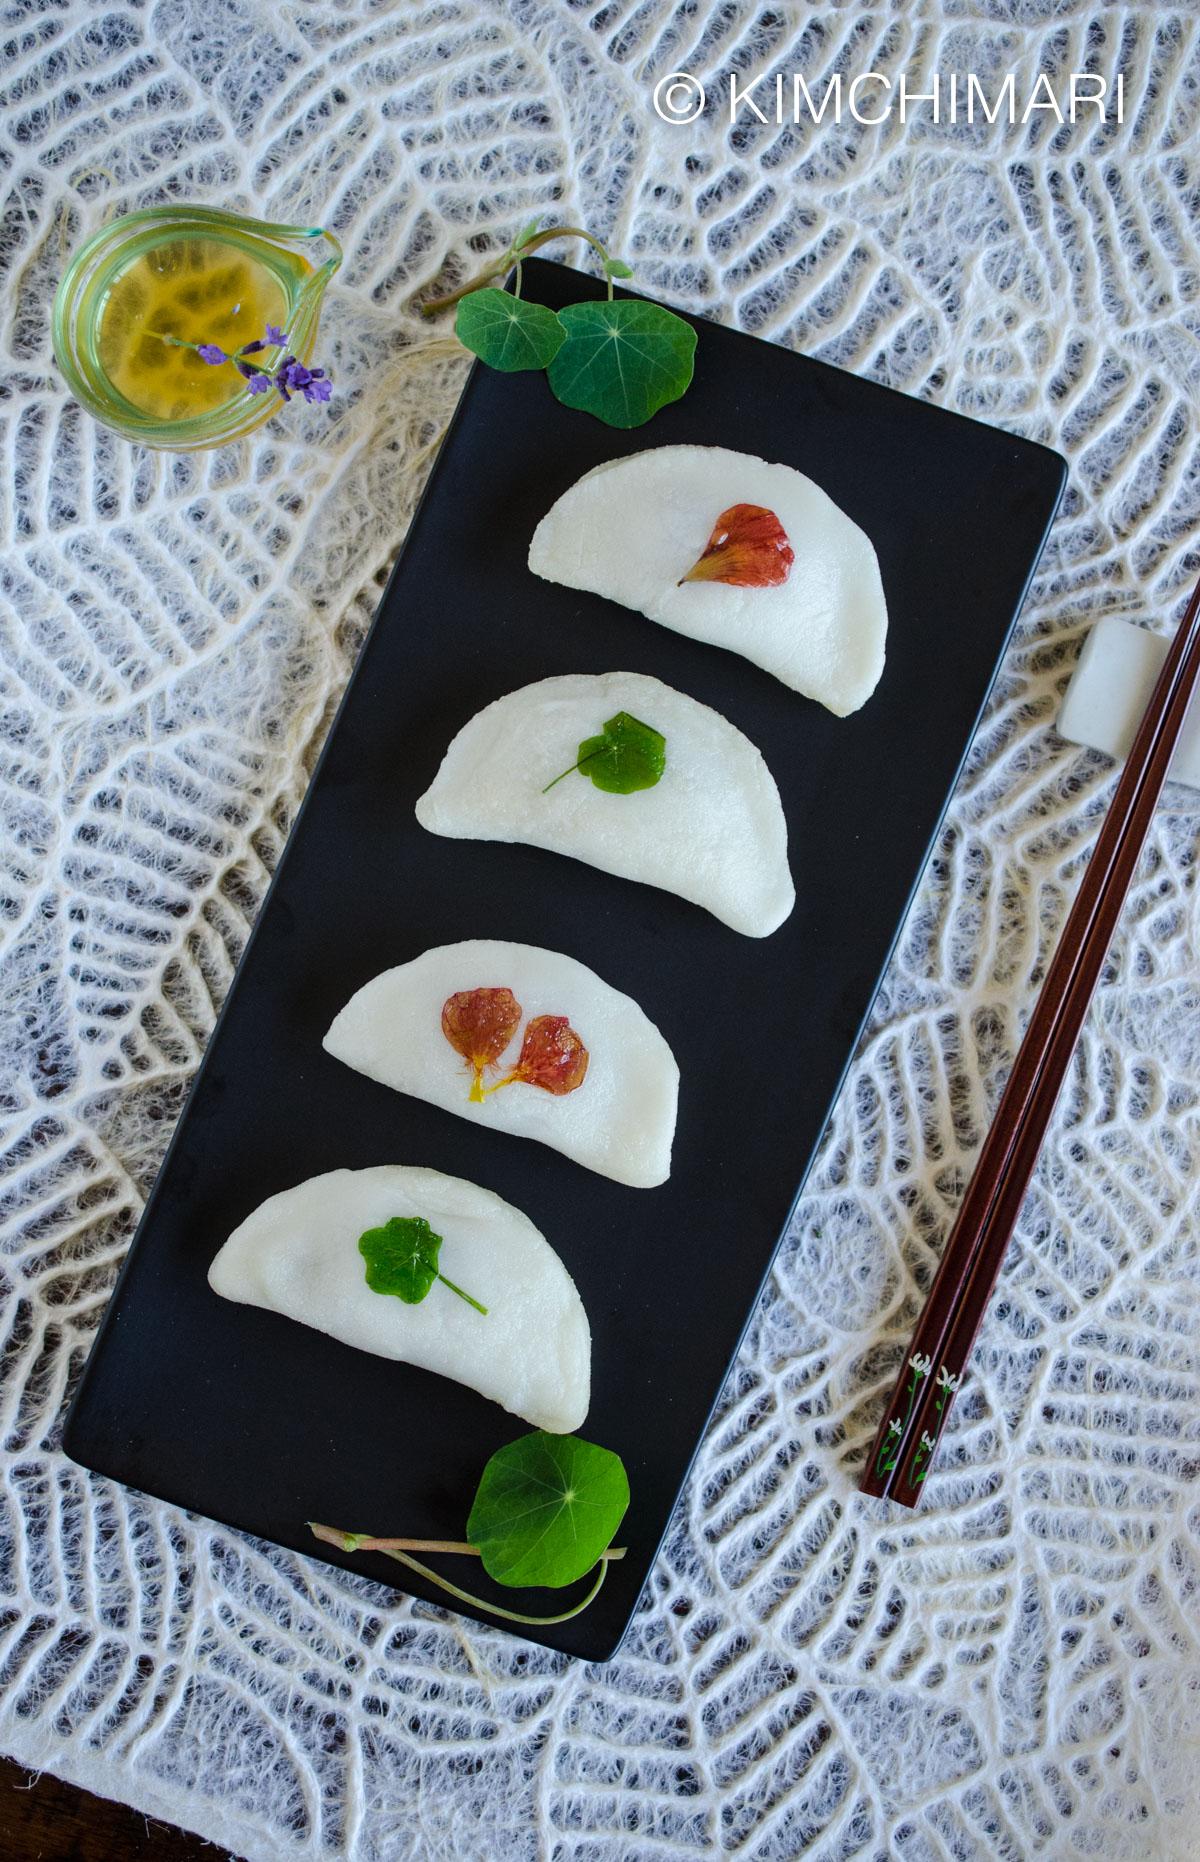 Pan-Fried Rice Cake Dumplings (Bukkumi) with Nasturtiums